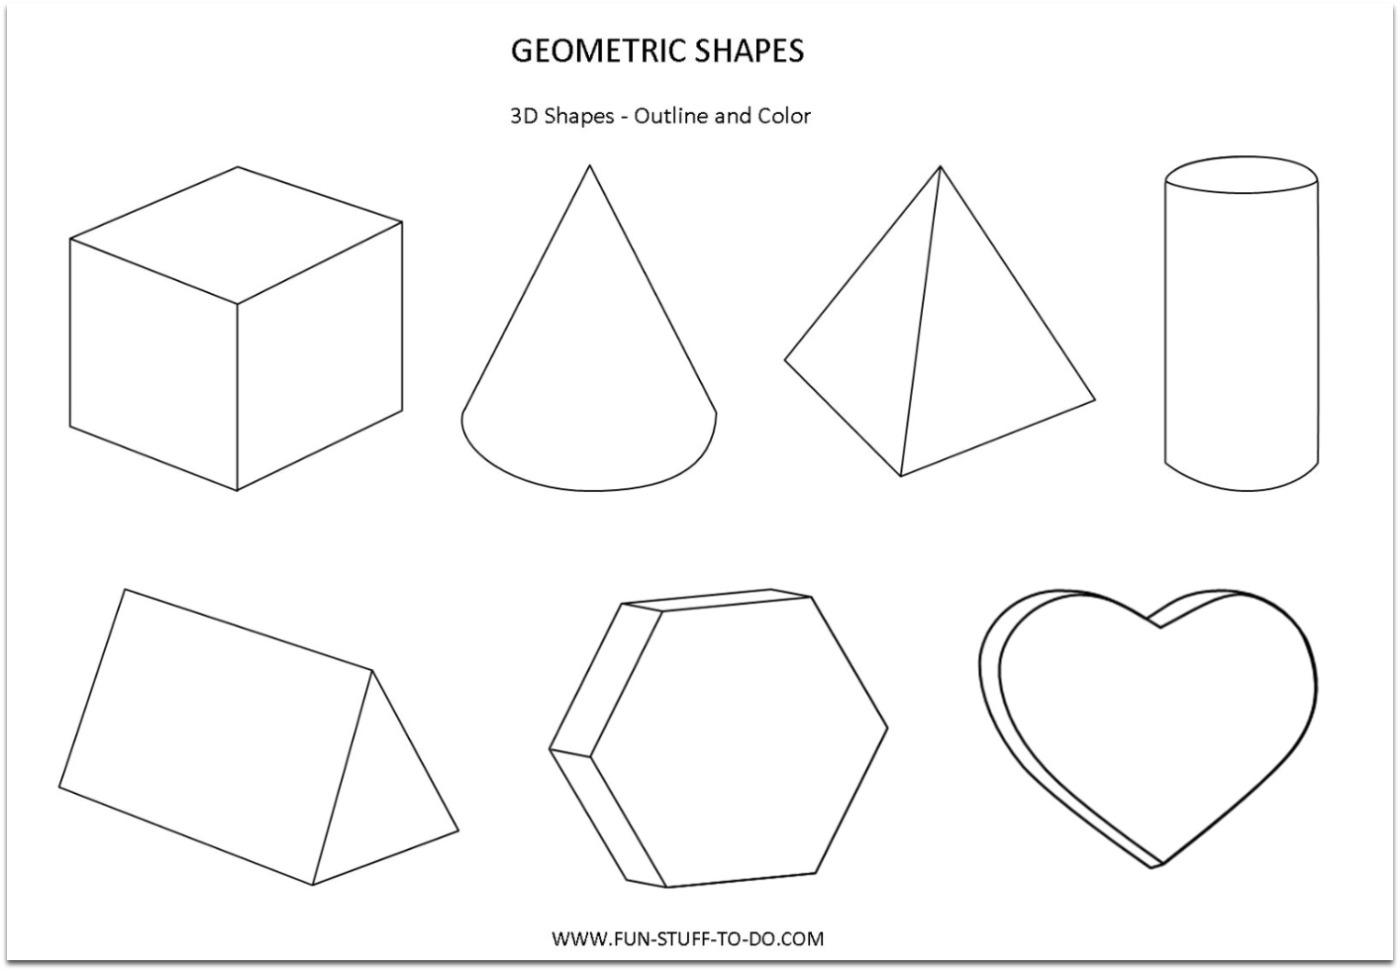 Drawn shapes geometric shape PRINT To Geometric Worksheets Print